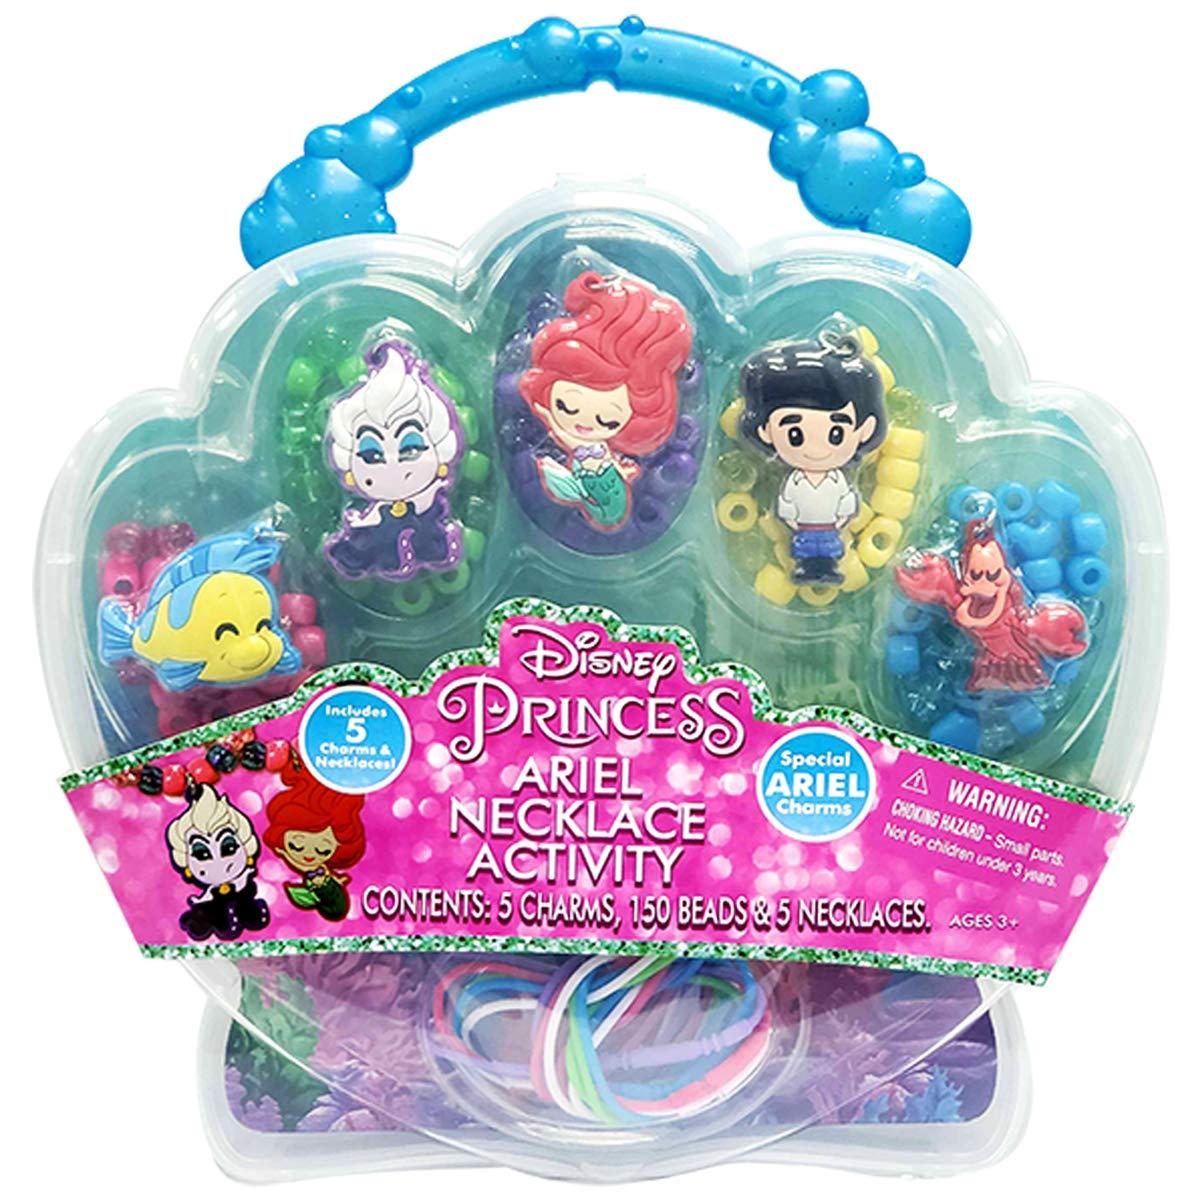 Tara Toys Princess Ariel Necklace Activity Set - Amazon Exclusive